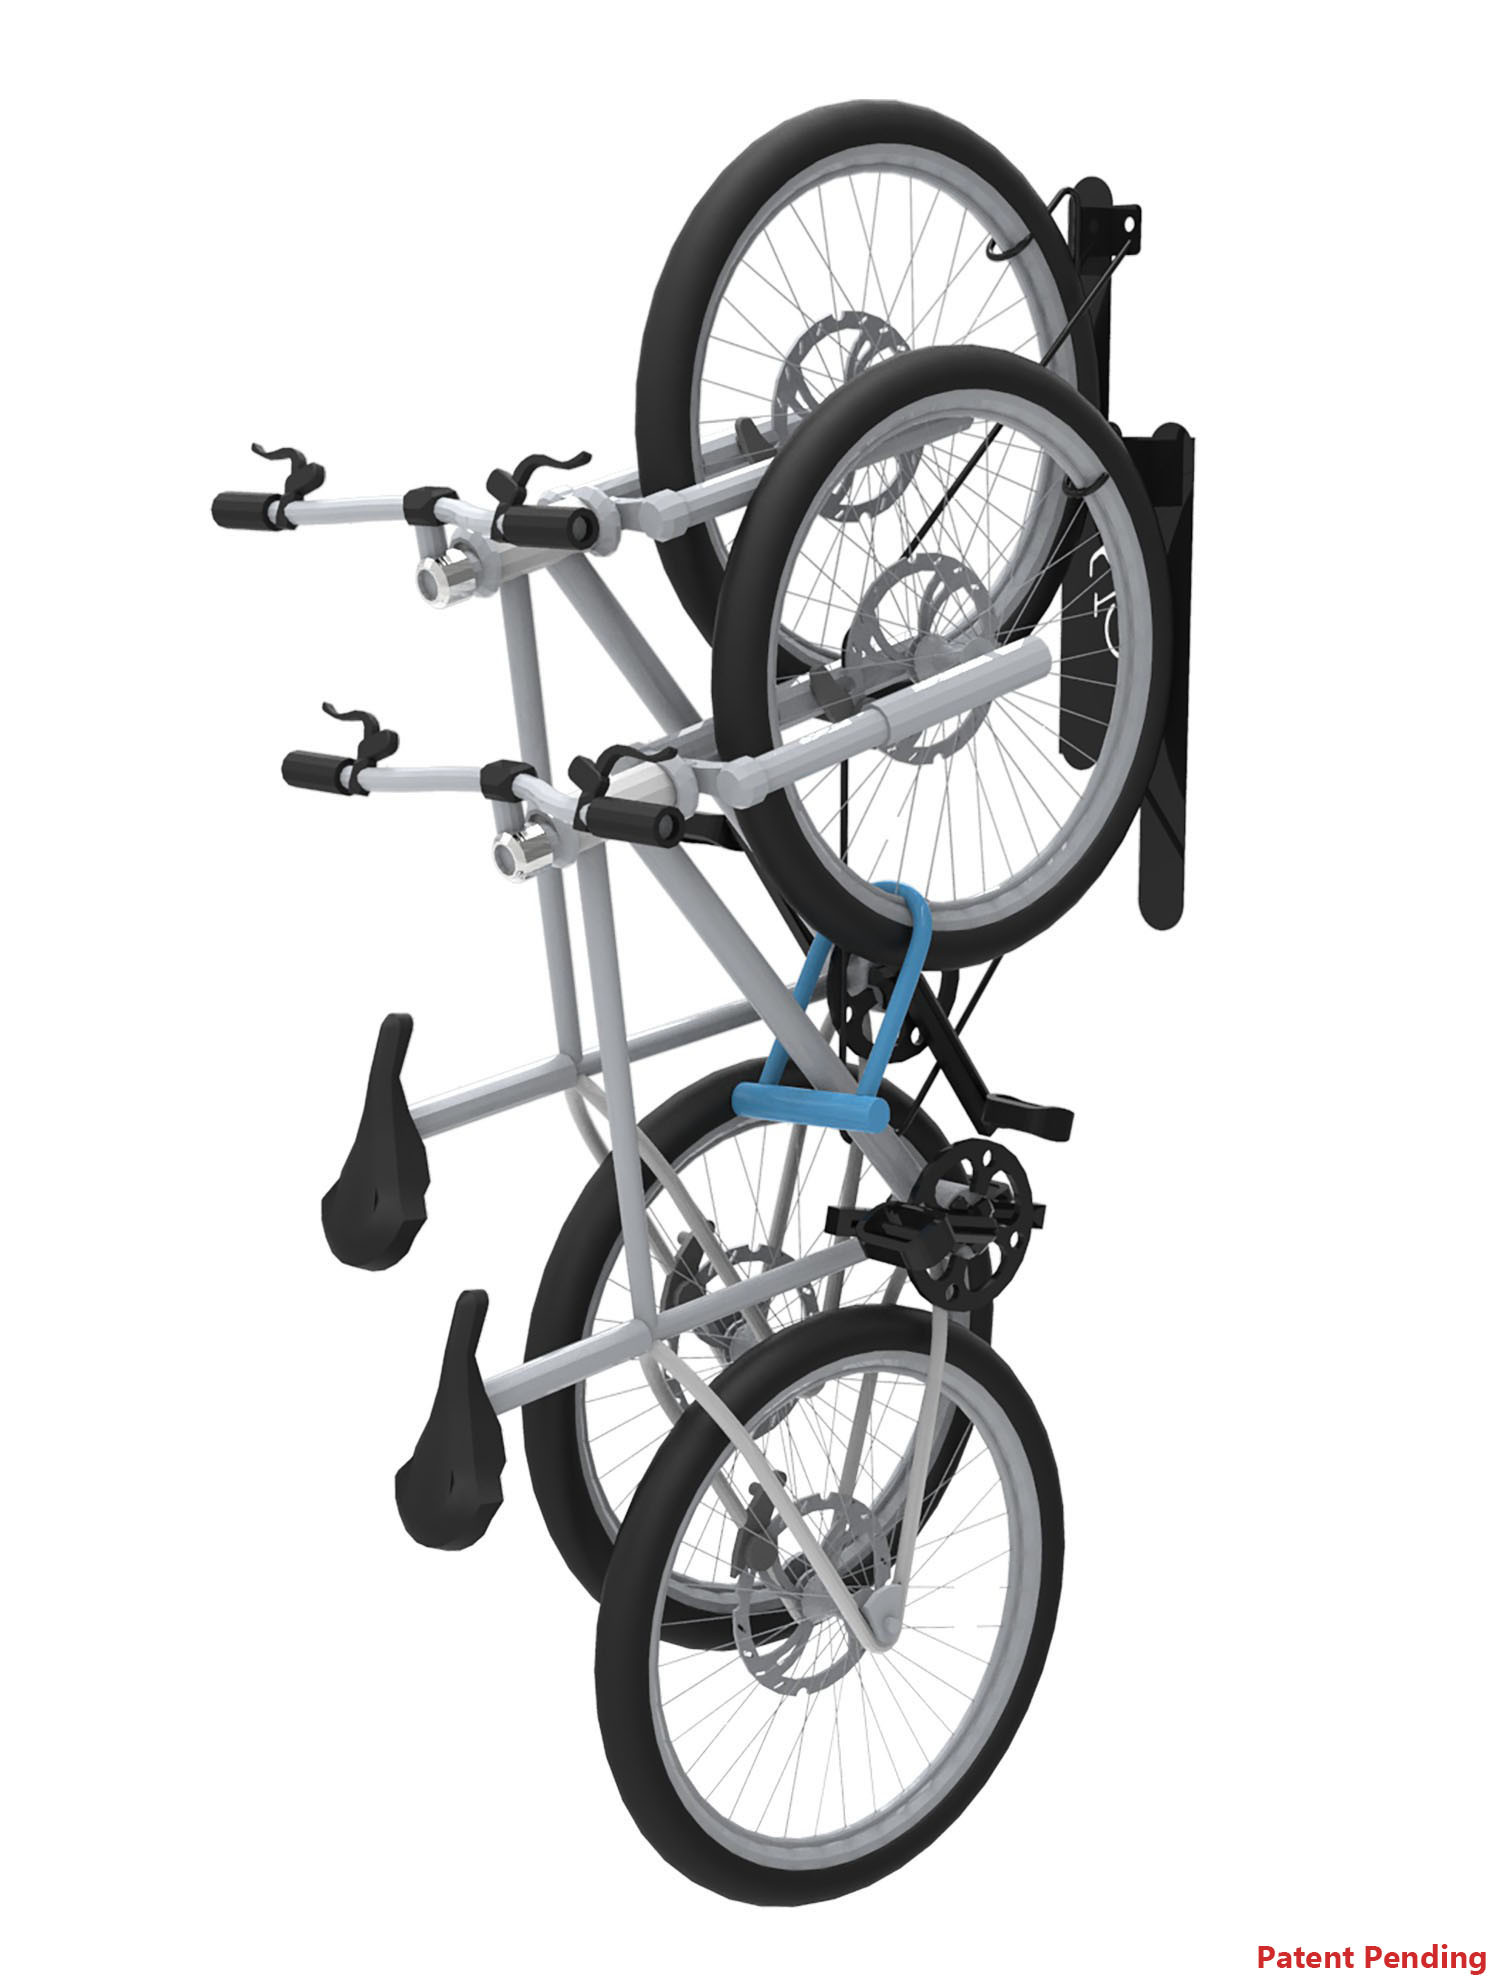 Doubleup Commercial Vertical Wall Mounted Bike Rack 2